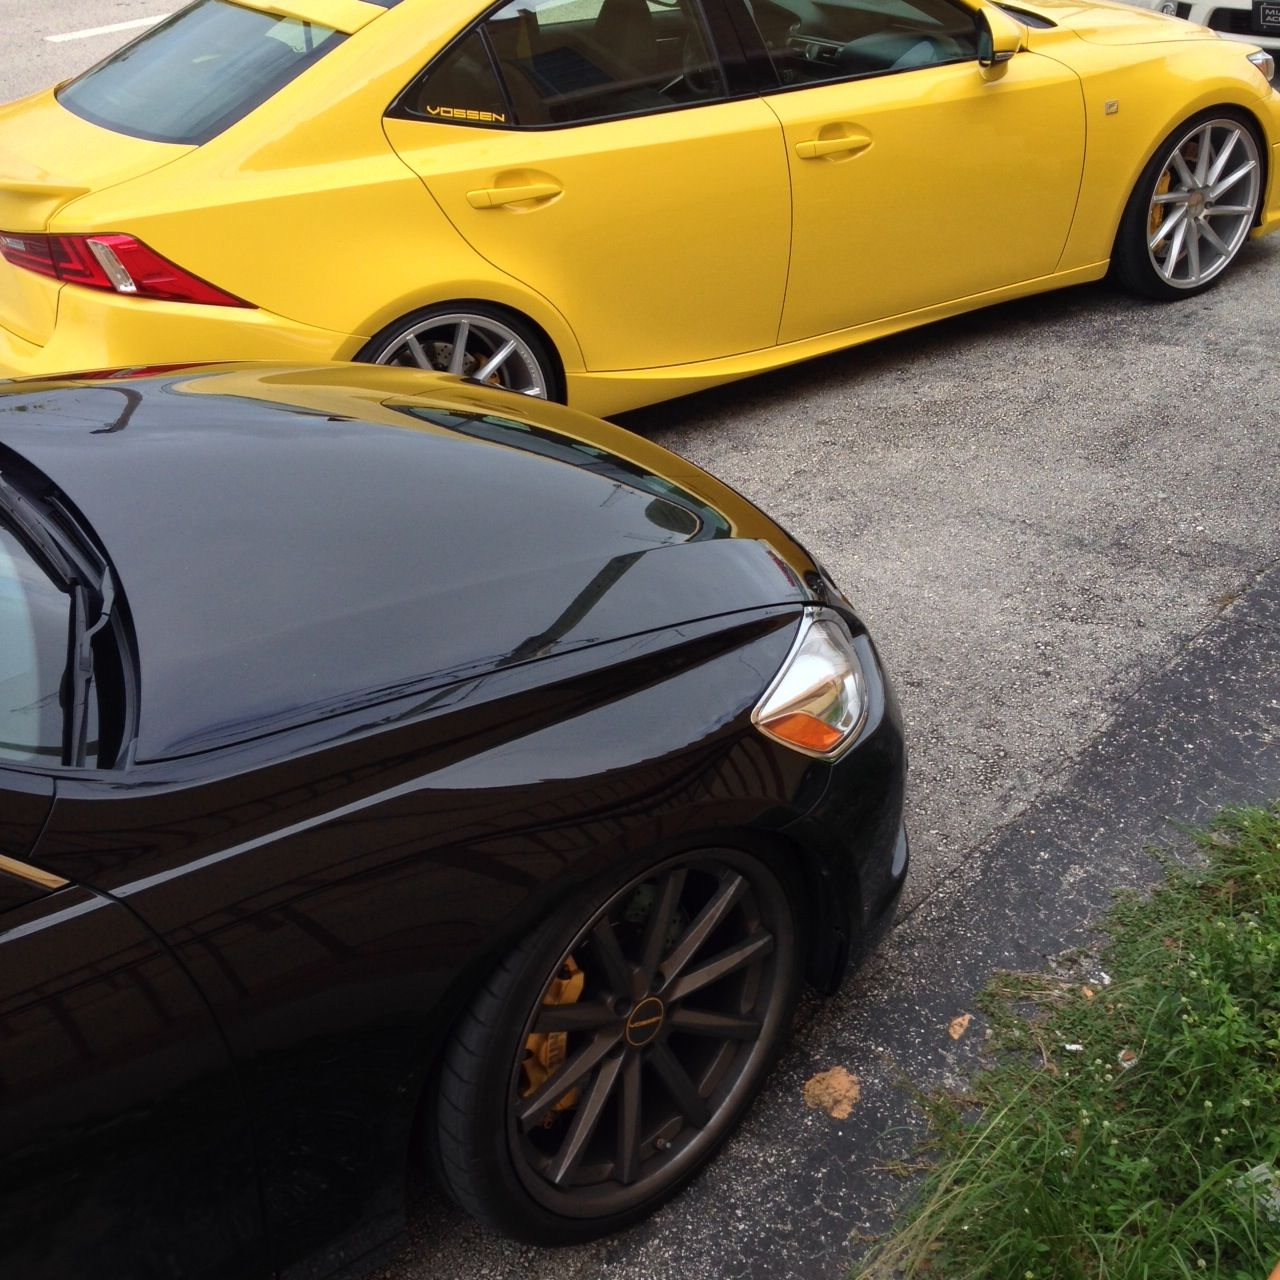 Black & Yellow! Lexus 2014 IS 350 F Sport 2007 GS 450h